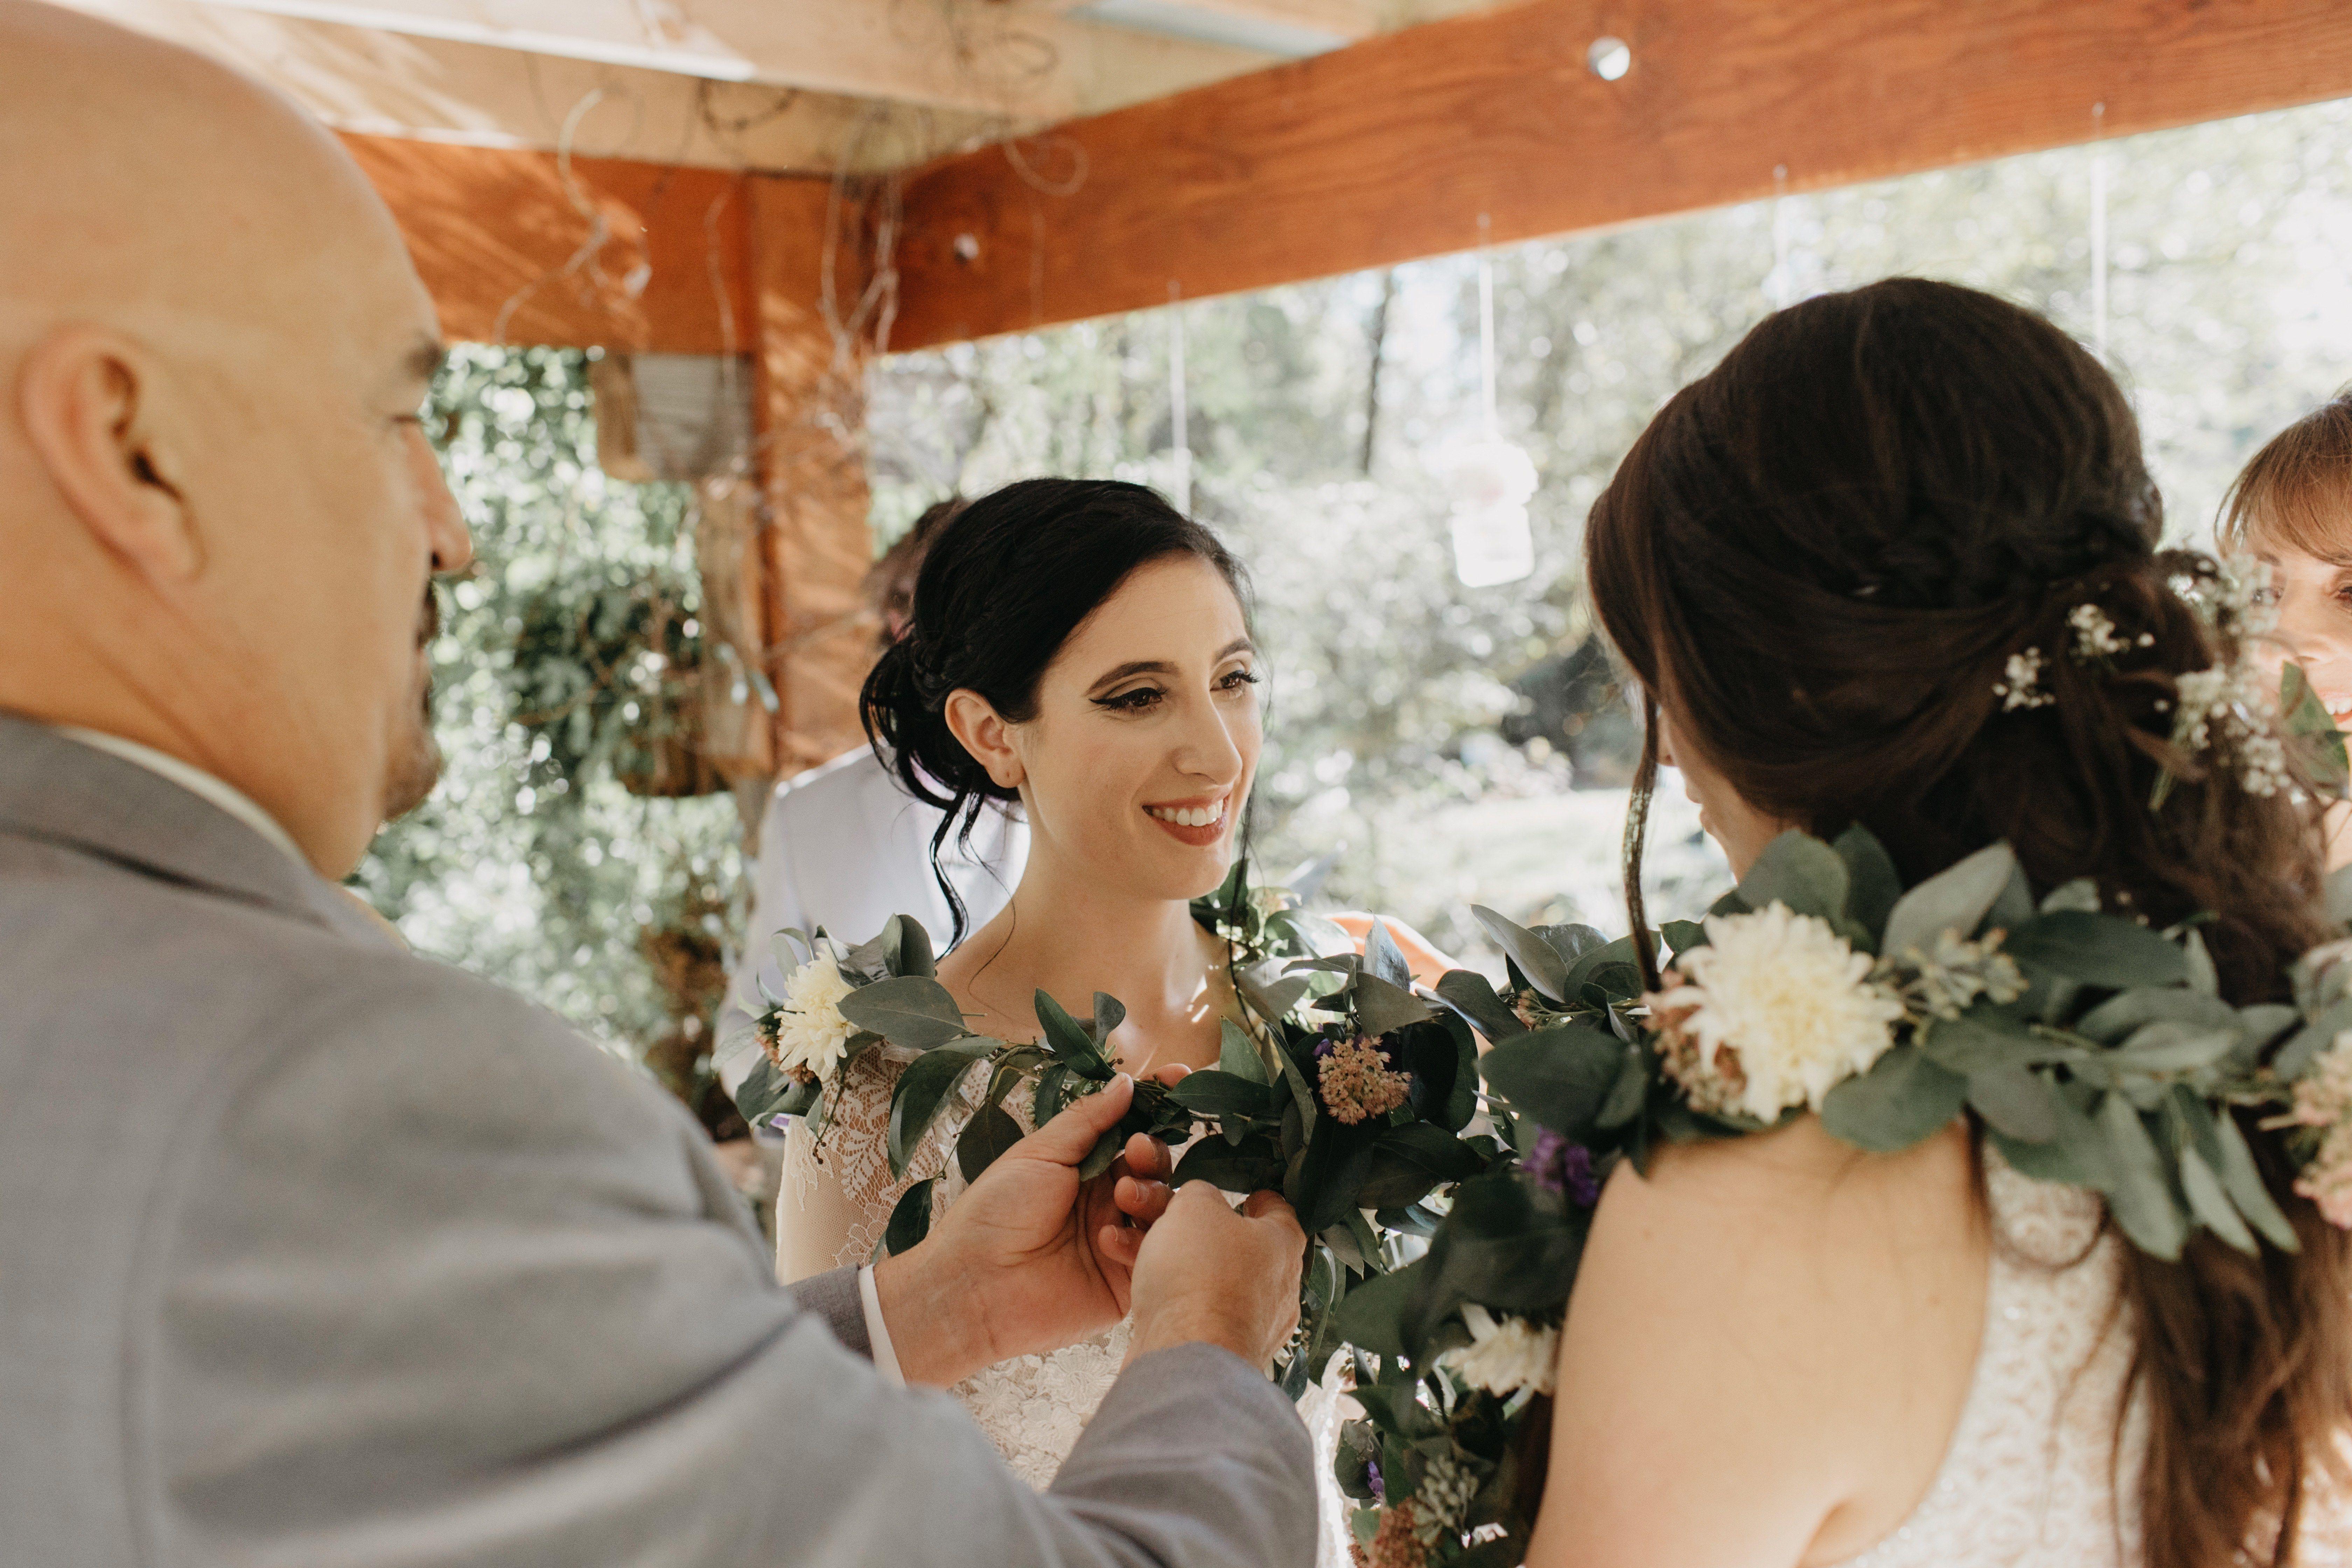 12 Creative Unity Ceremony Ideas for Your Wedding Unity